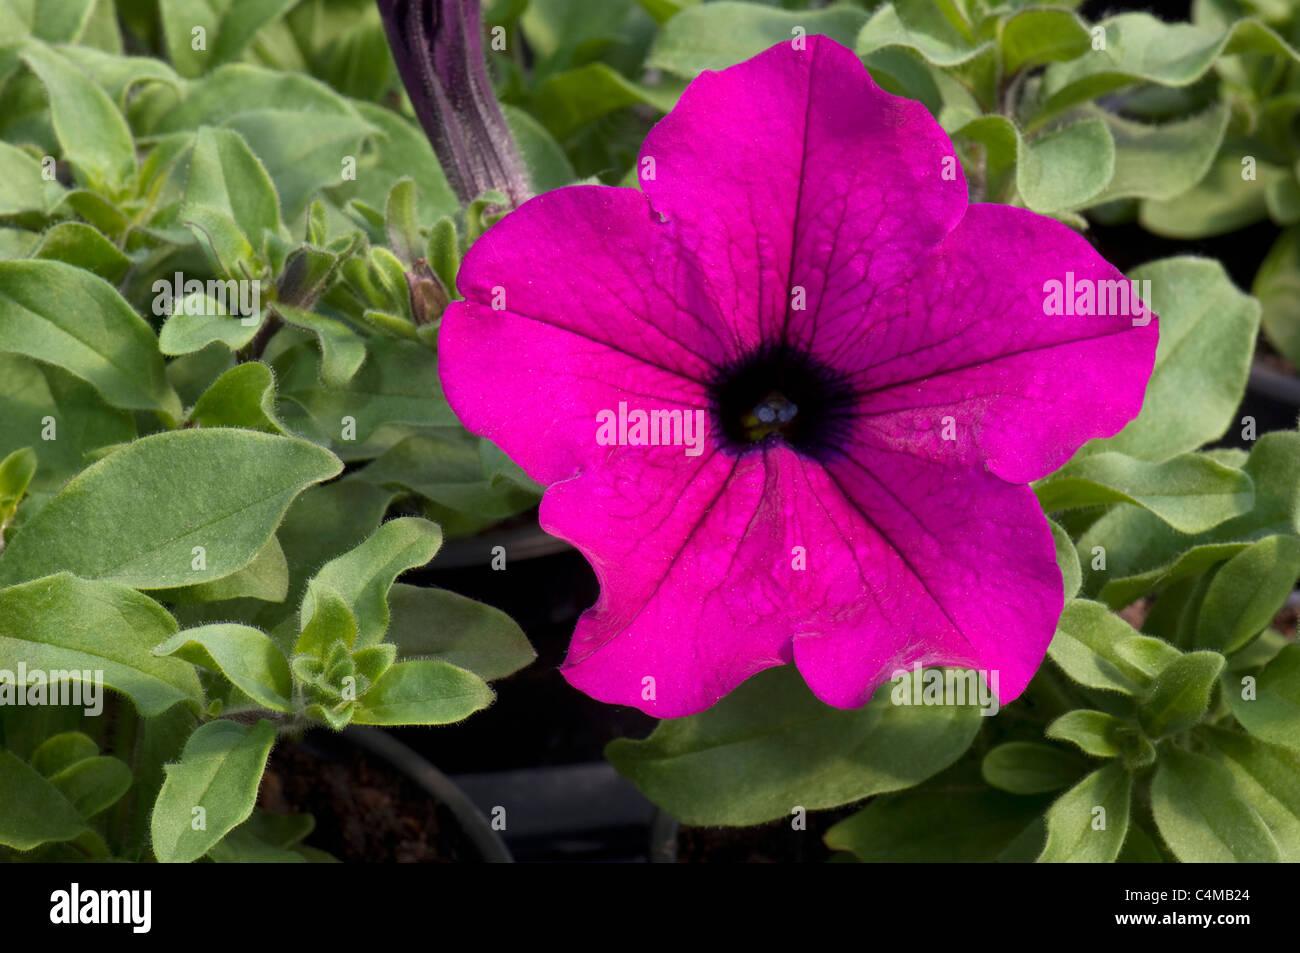 Garden Petunia (Petunia x hybrida), purple flower. - Stock Image